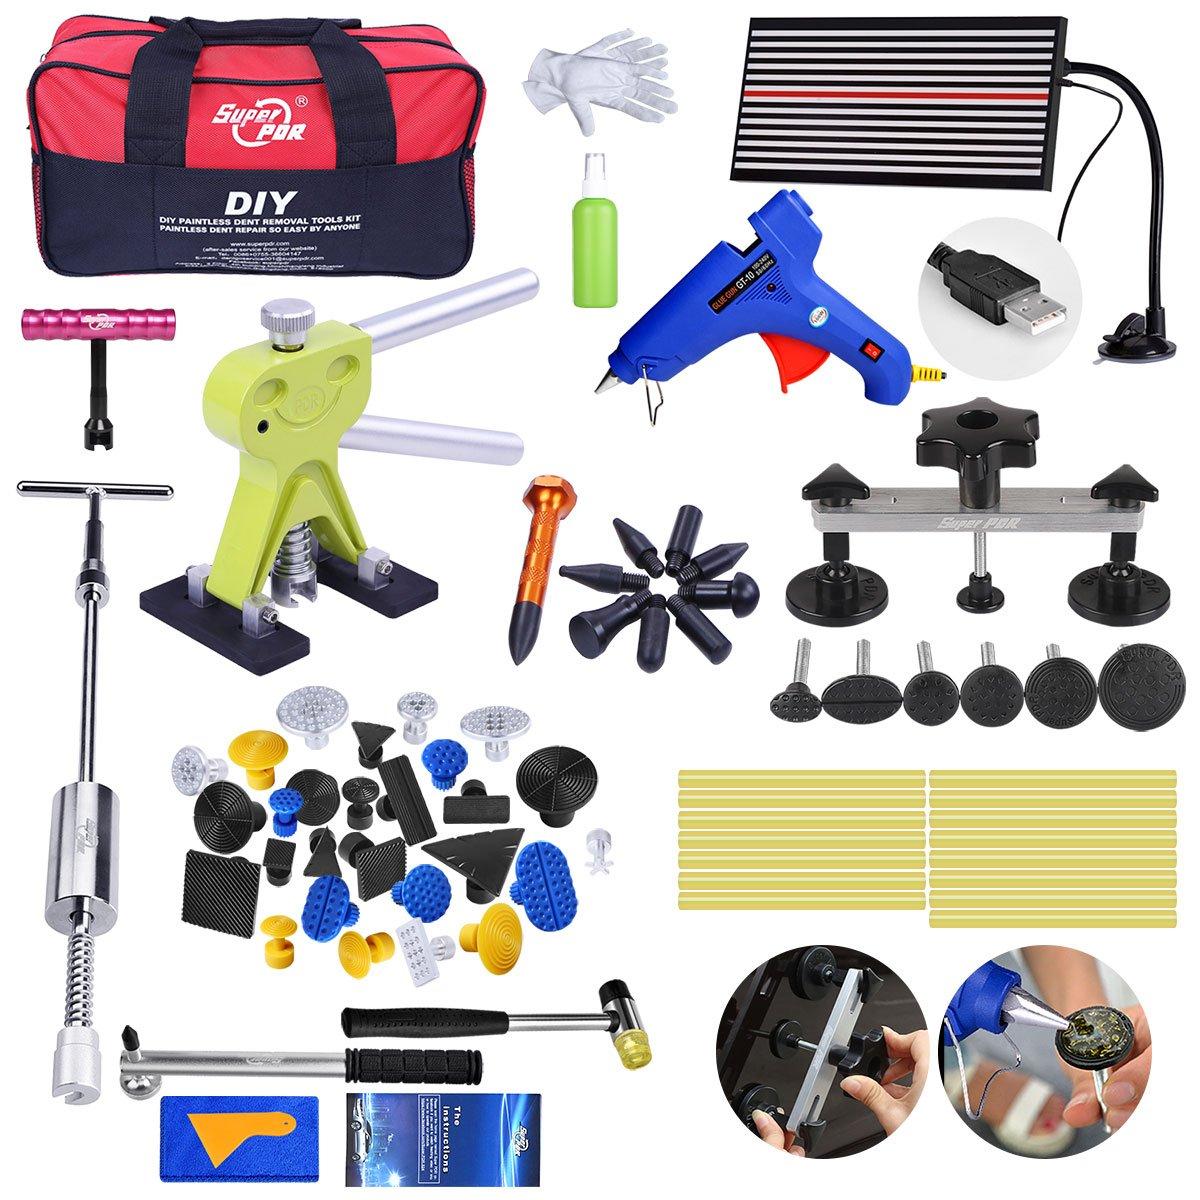 Pdr Tool Pops a Dent Puller Kit for Car Body Dent Repair (PC-29)